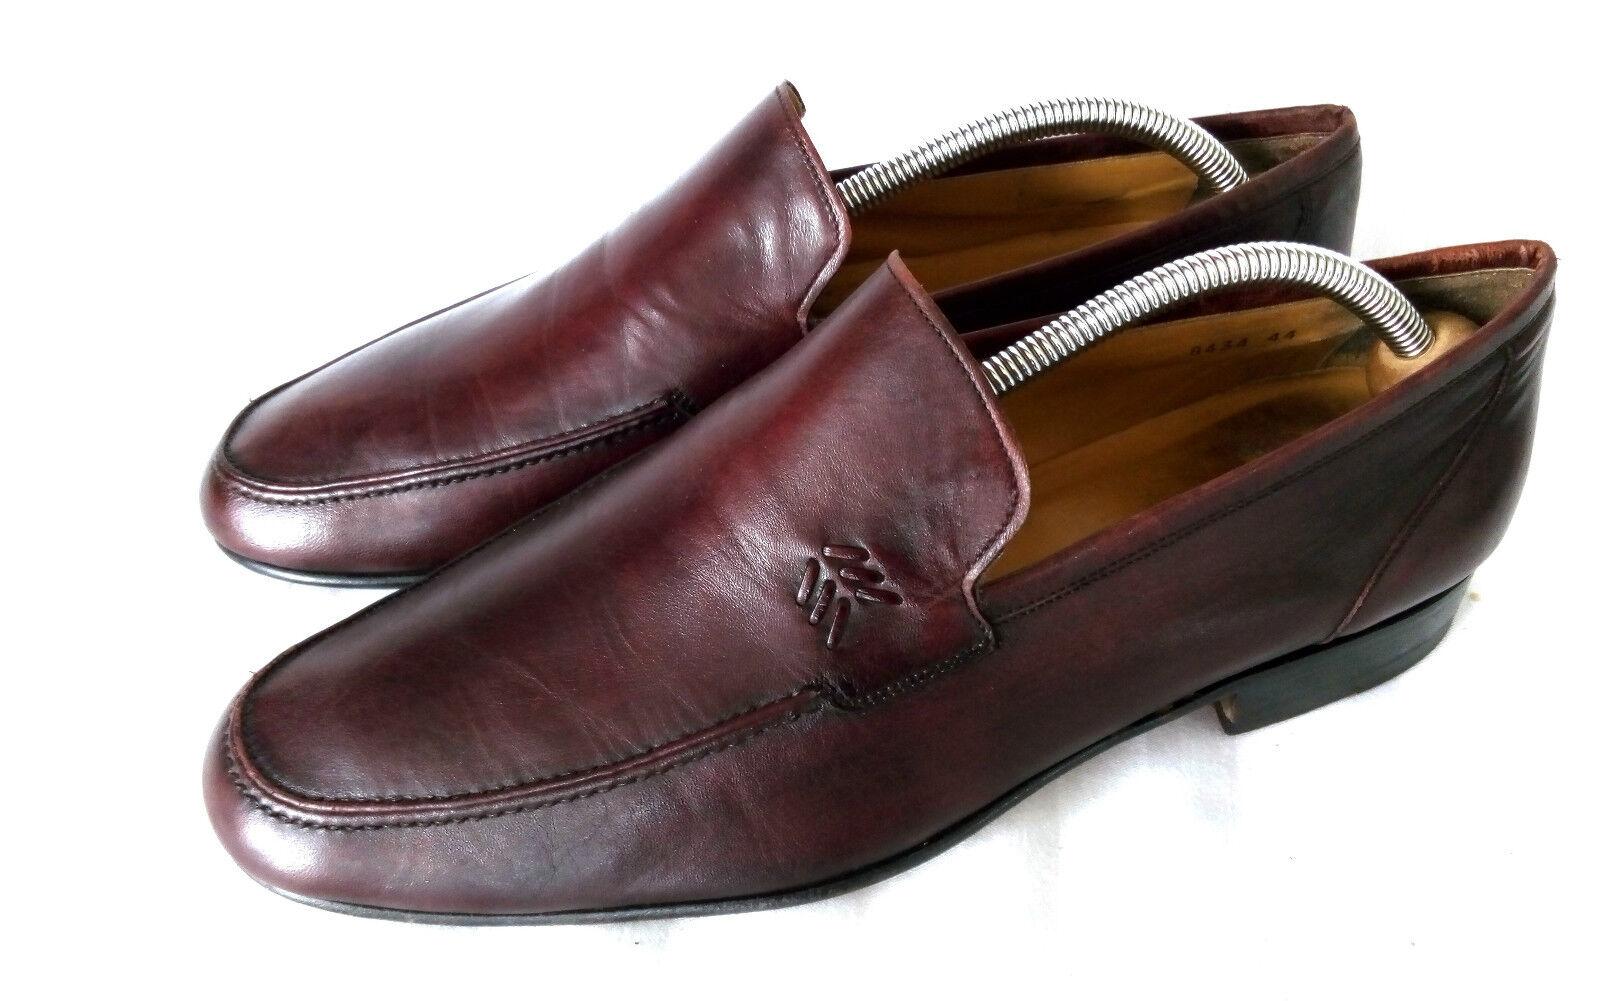 Magnanni elegante cuero loafer mocasín Apron Toe Burgundy Oxblood Nappa cuero elegante 44,5 45 fafed4